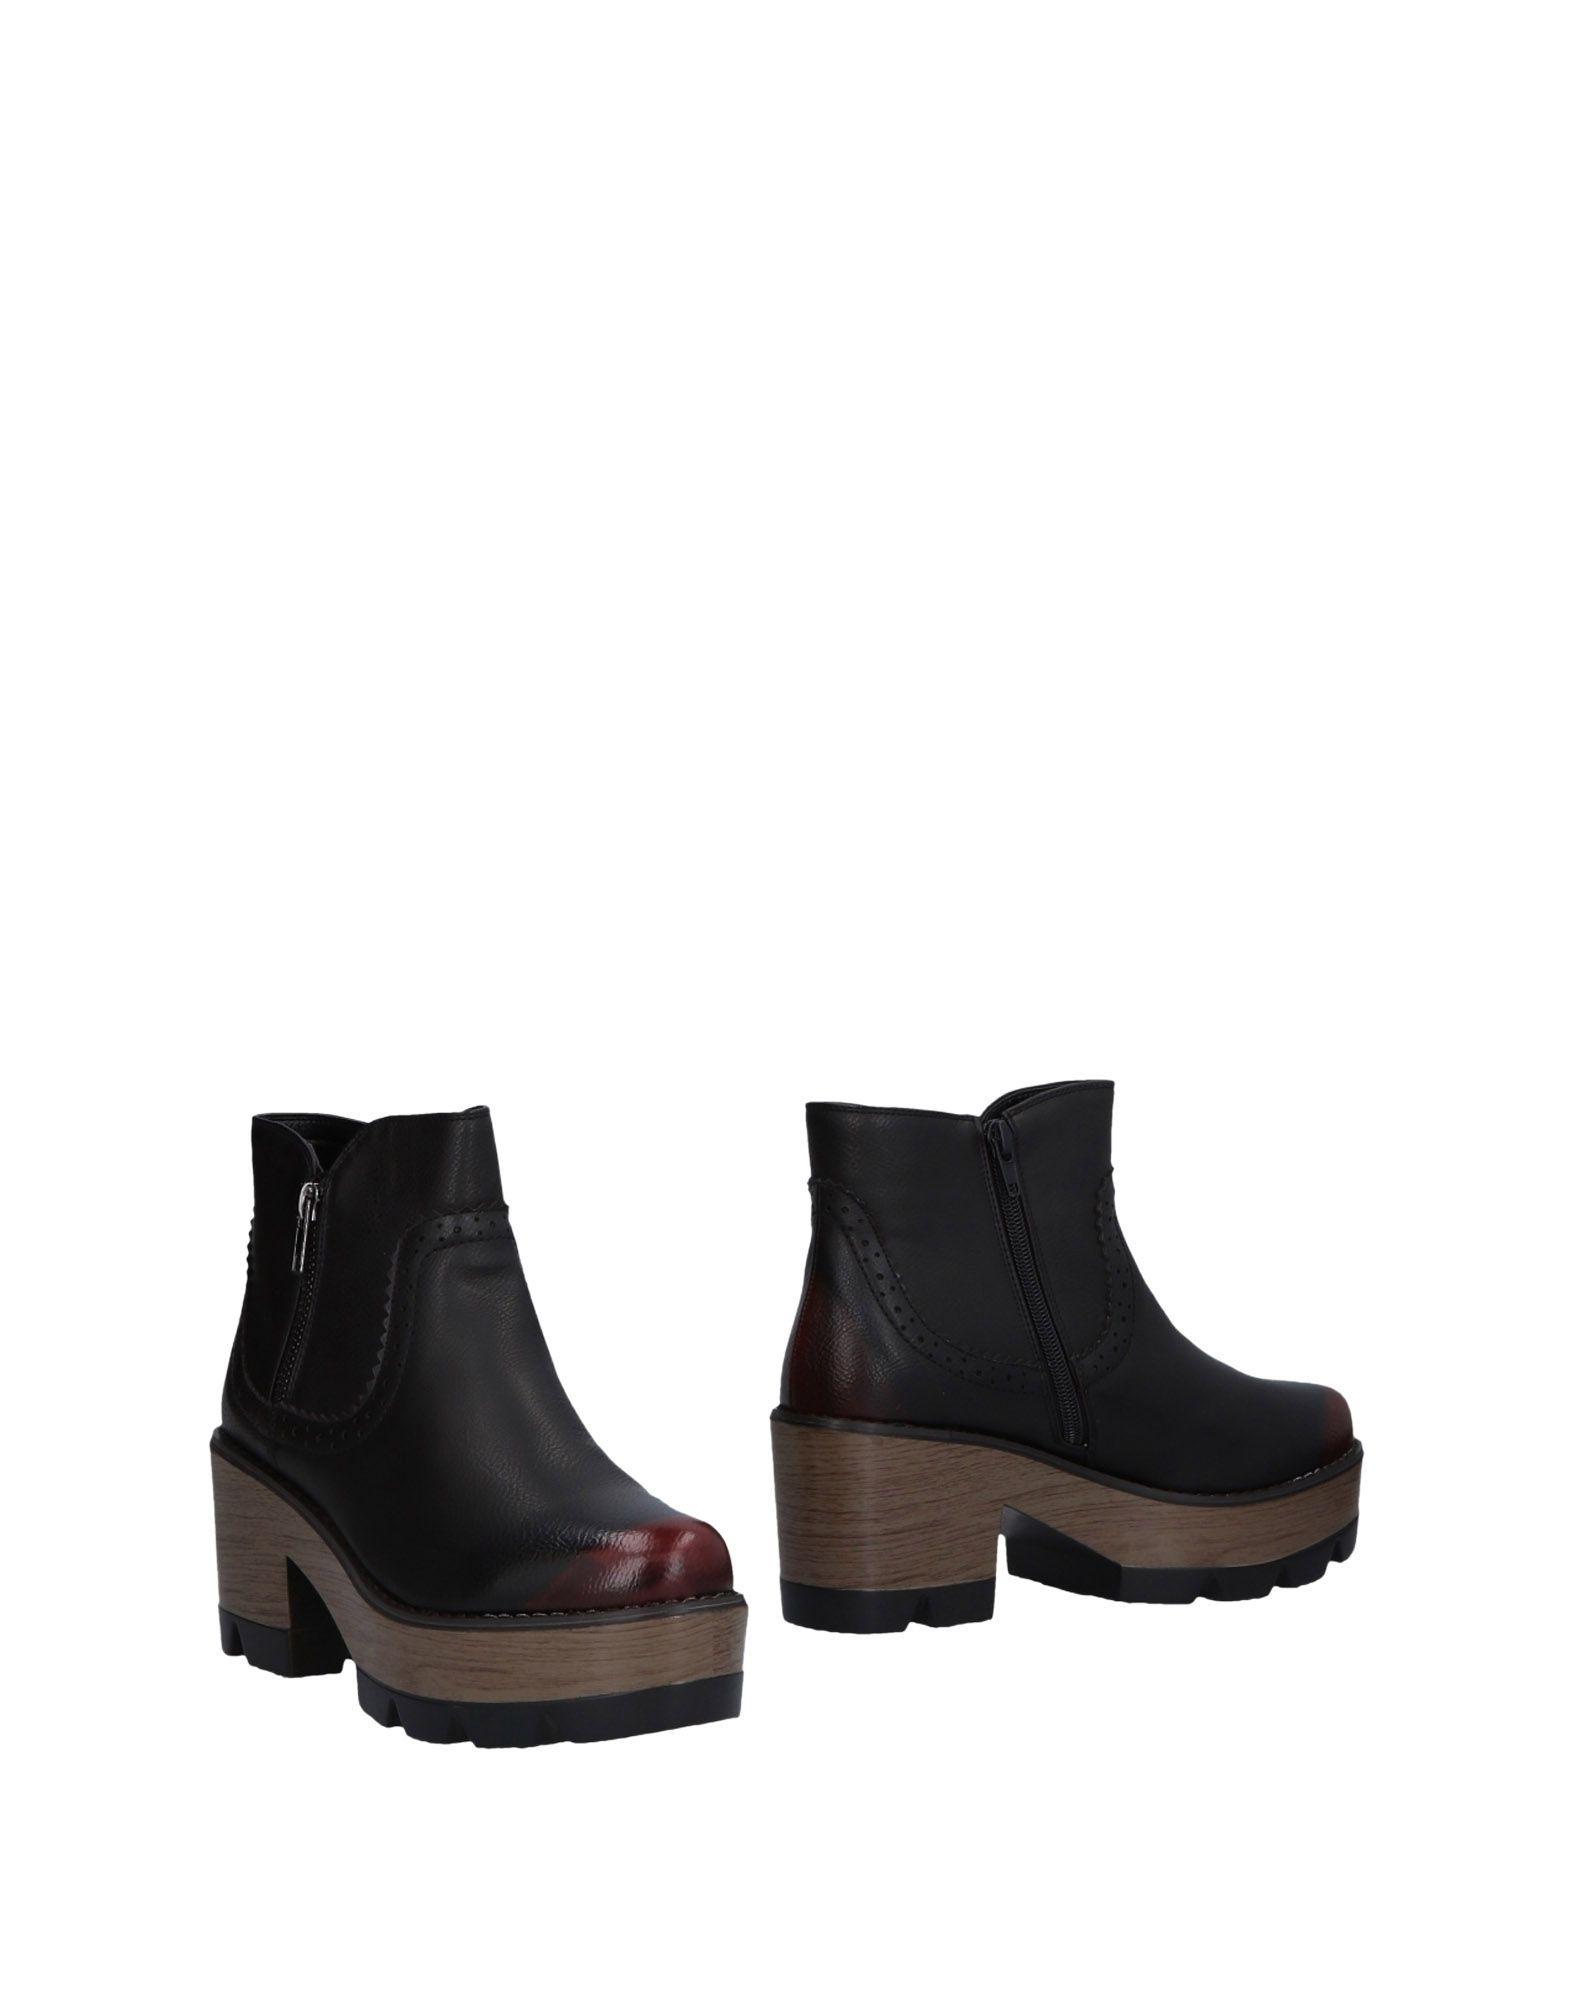 Police 11477165OG 883 Stiefelette Damen  11477165OG Police Gute Qualität beliebte Schuhe 5da1e9